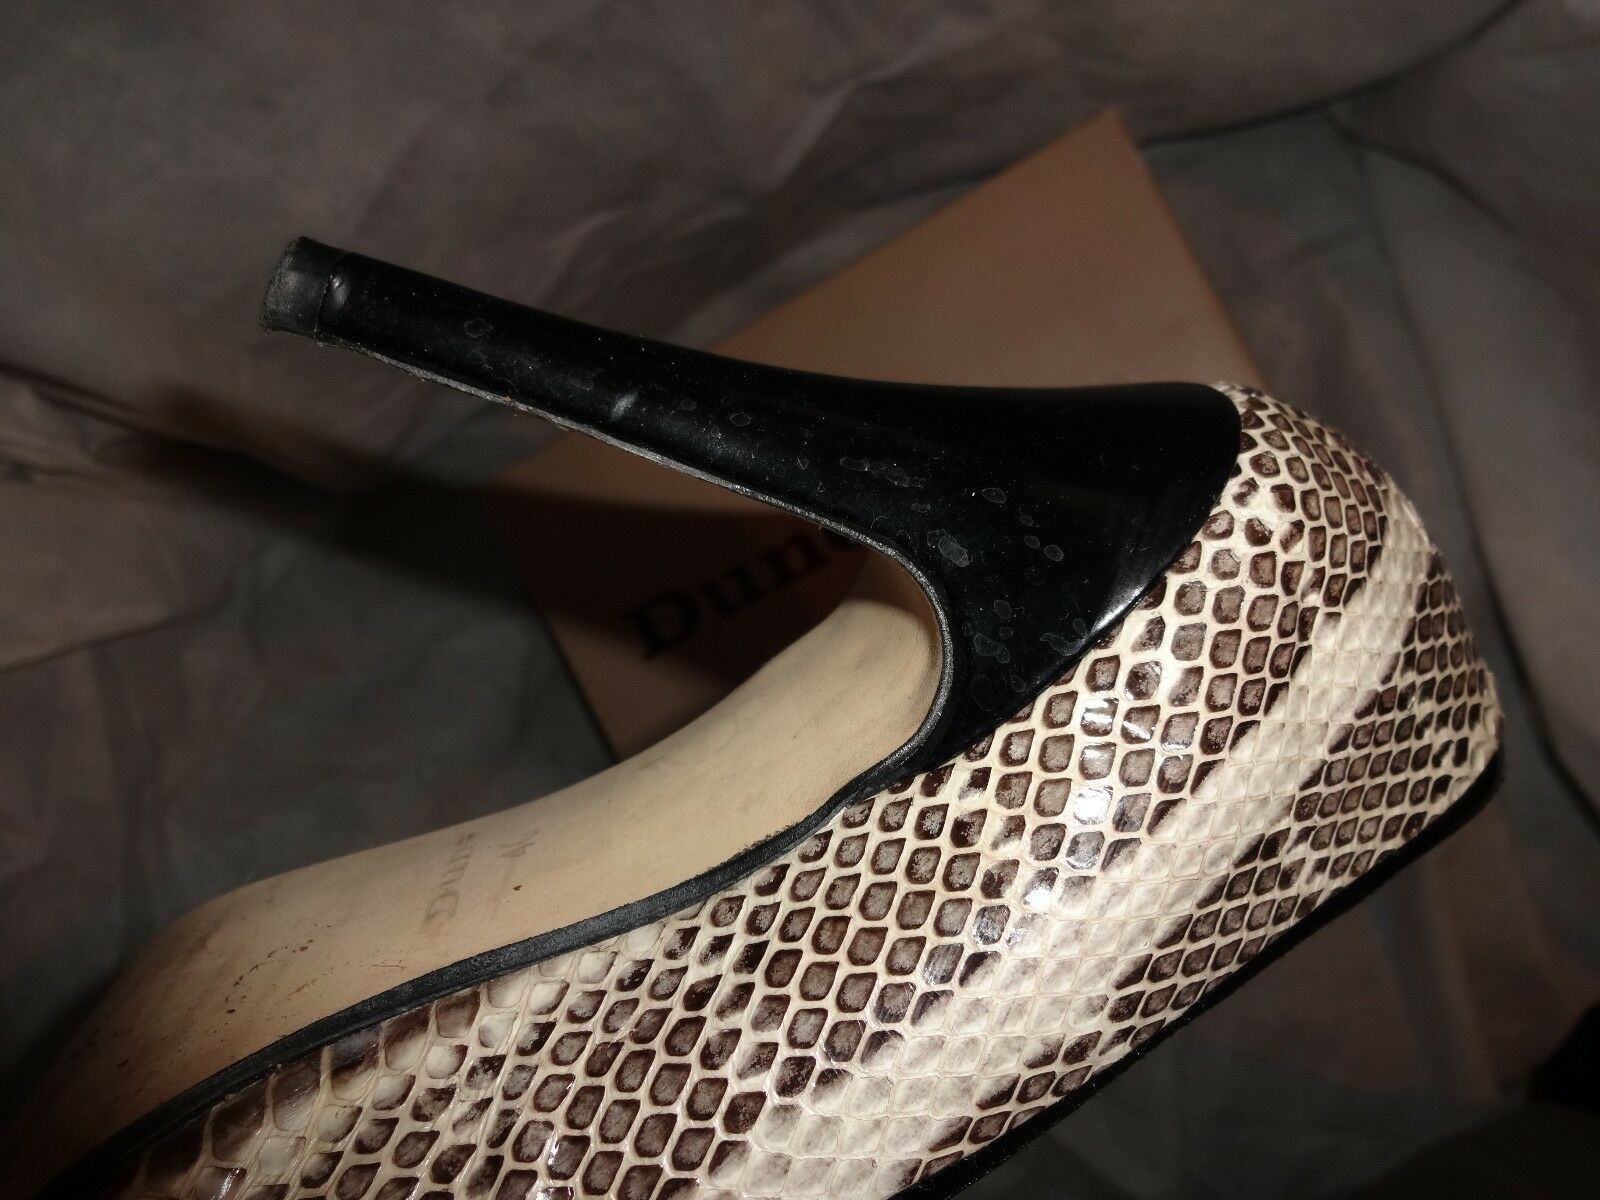 DUNE WOMEN'S SNAKEPRINT/BLACK   SLIP ON HEEL SHOE   SIZE UK 7 EU 40  VGC 6648d3